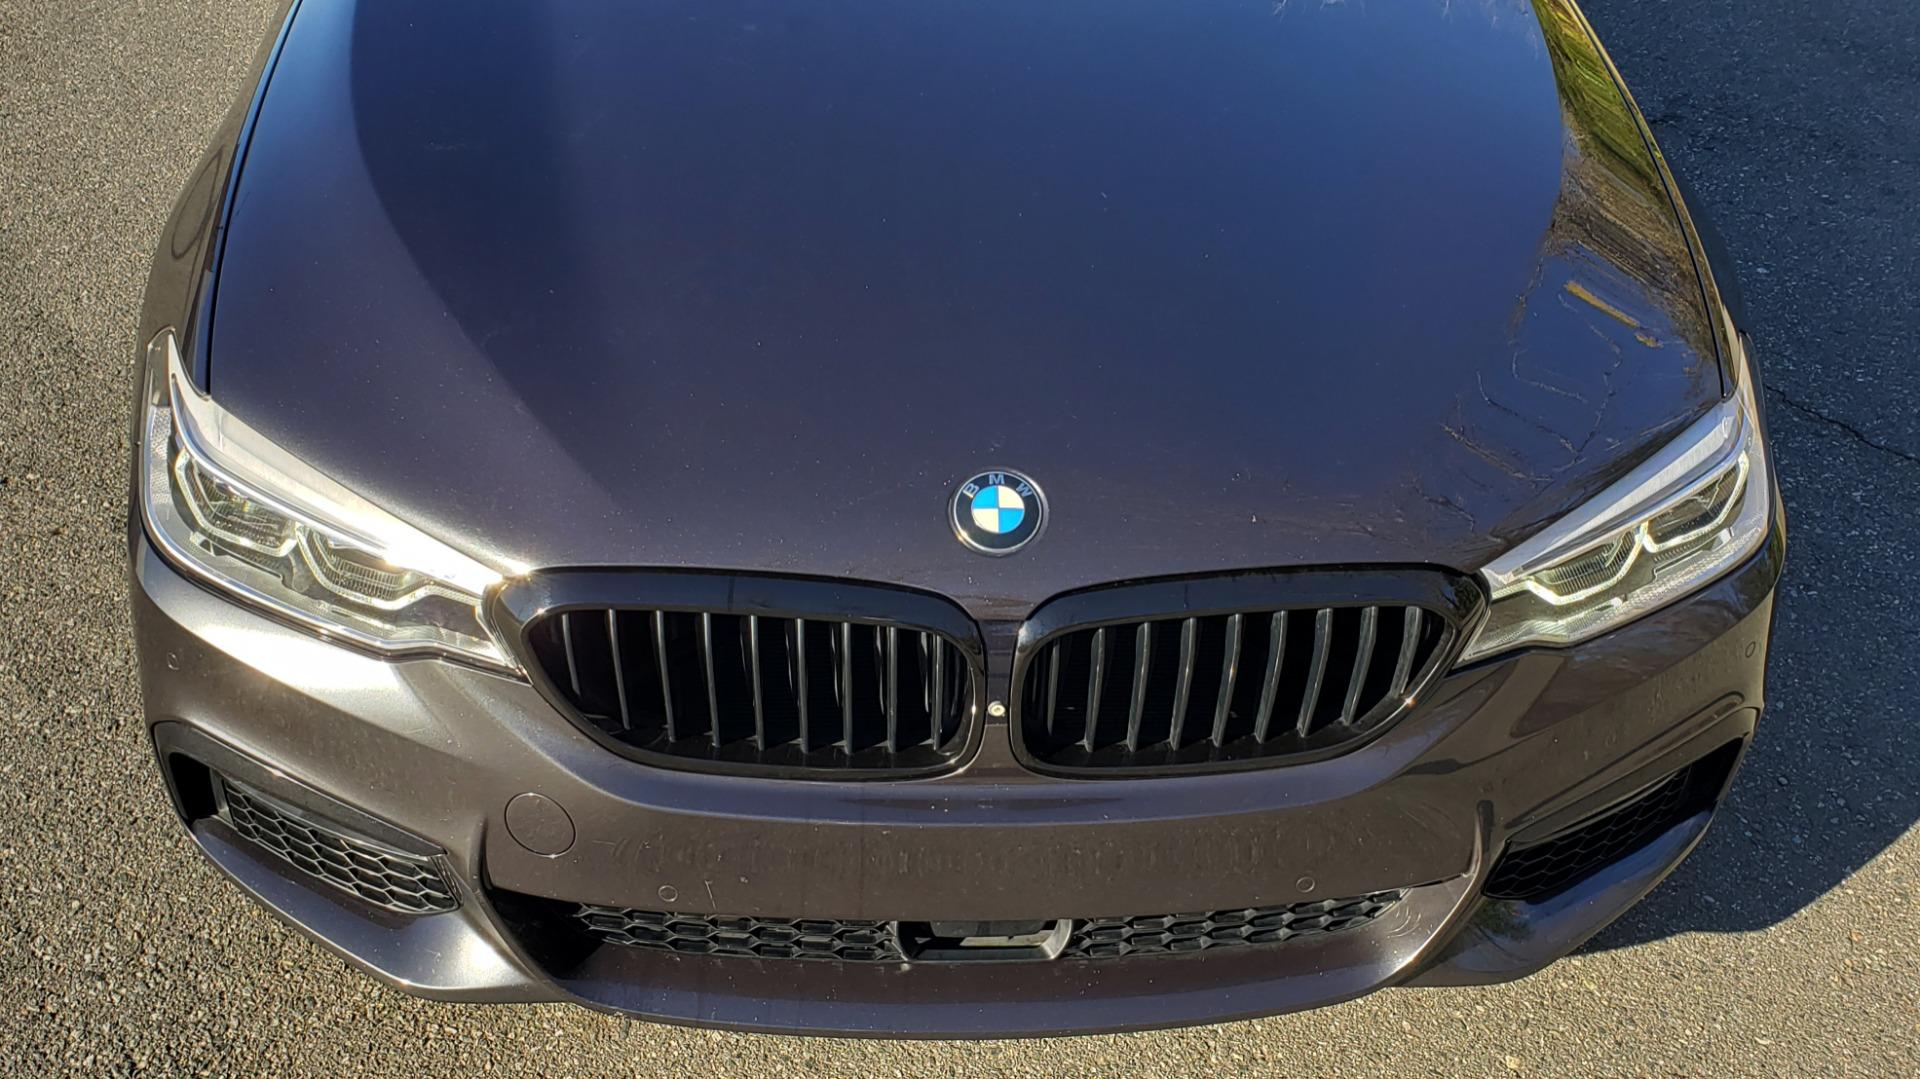 Used 2018 BMW 5 SERIES 540I M-SPORT / DRVR ASST / EXEC PKG / NAV / SUNROOF / HUD / REARVIEW for sale Sold at Formula Imports in Charlotte NC 28227 15